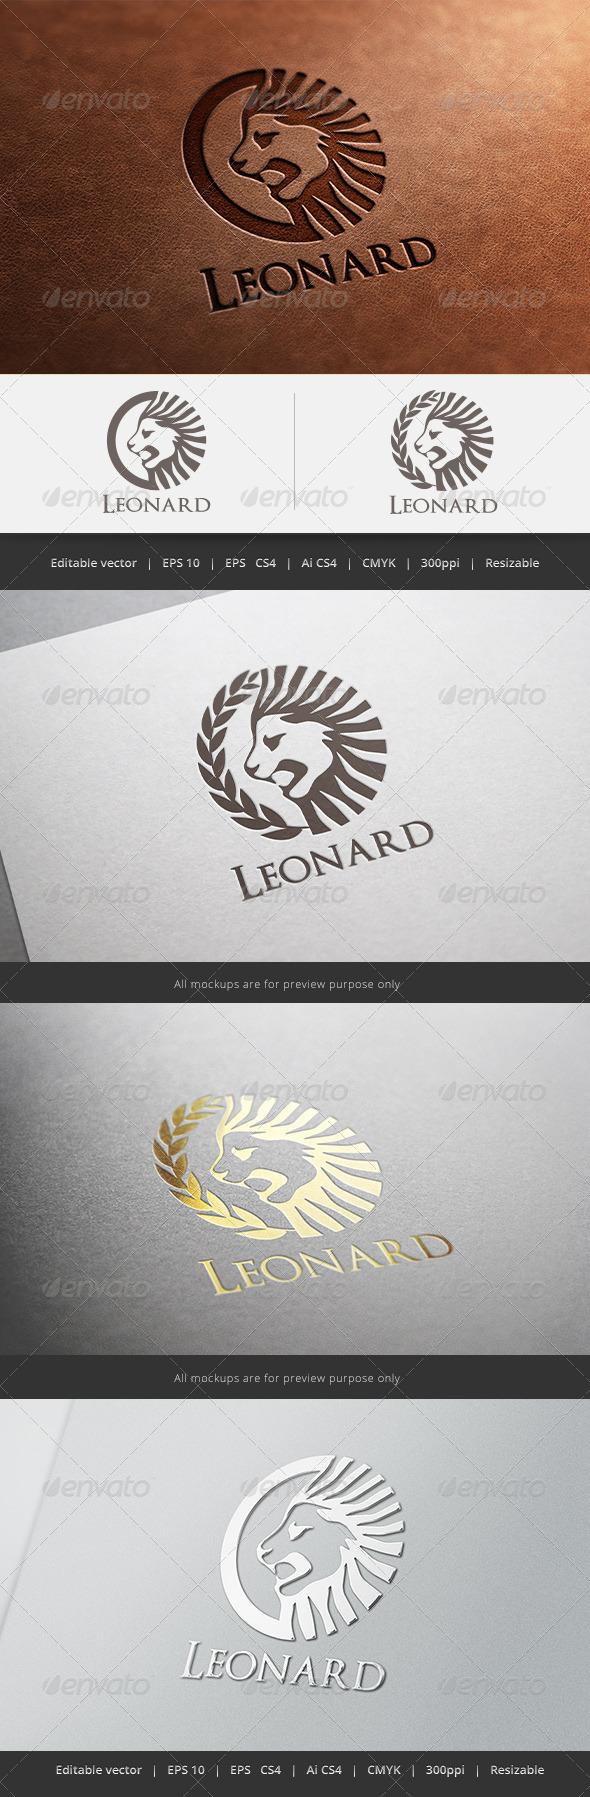 GraphicRiver Leonard Logo 5596891